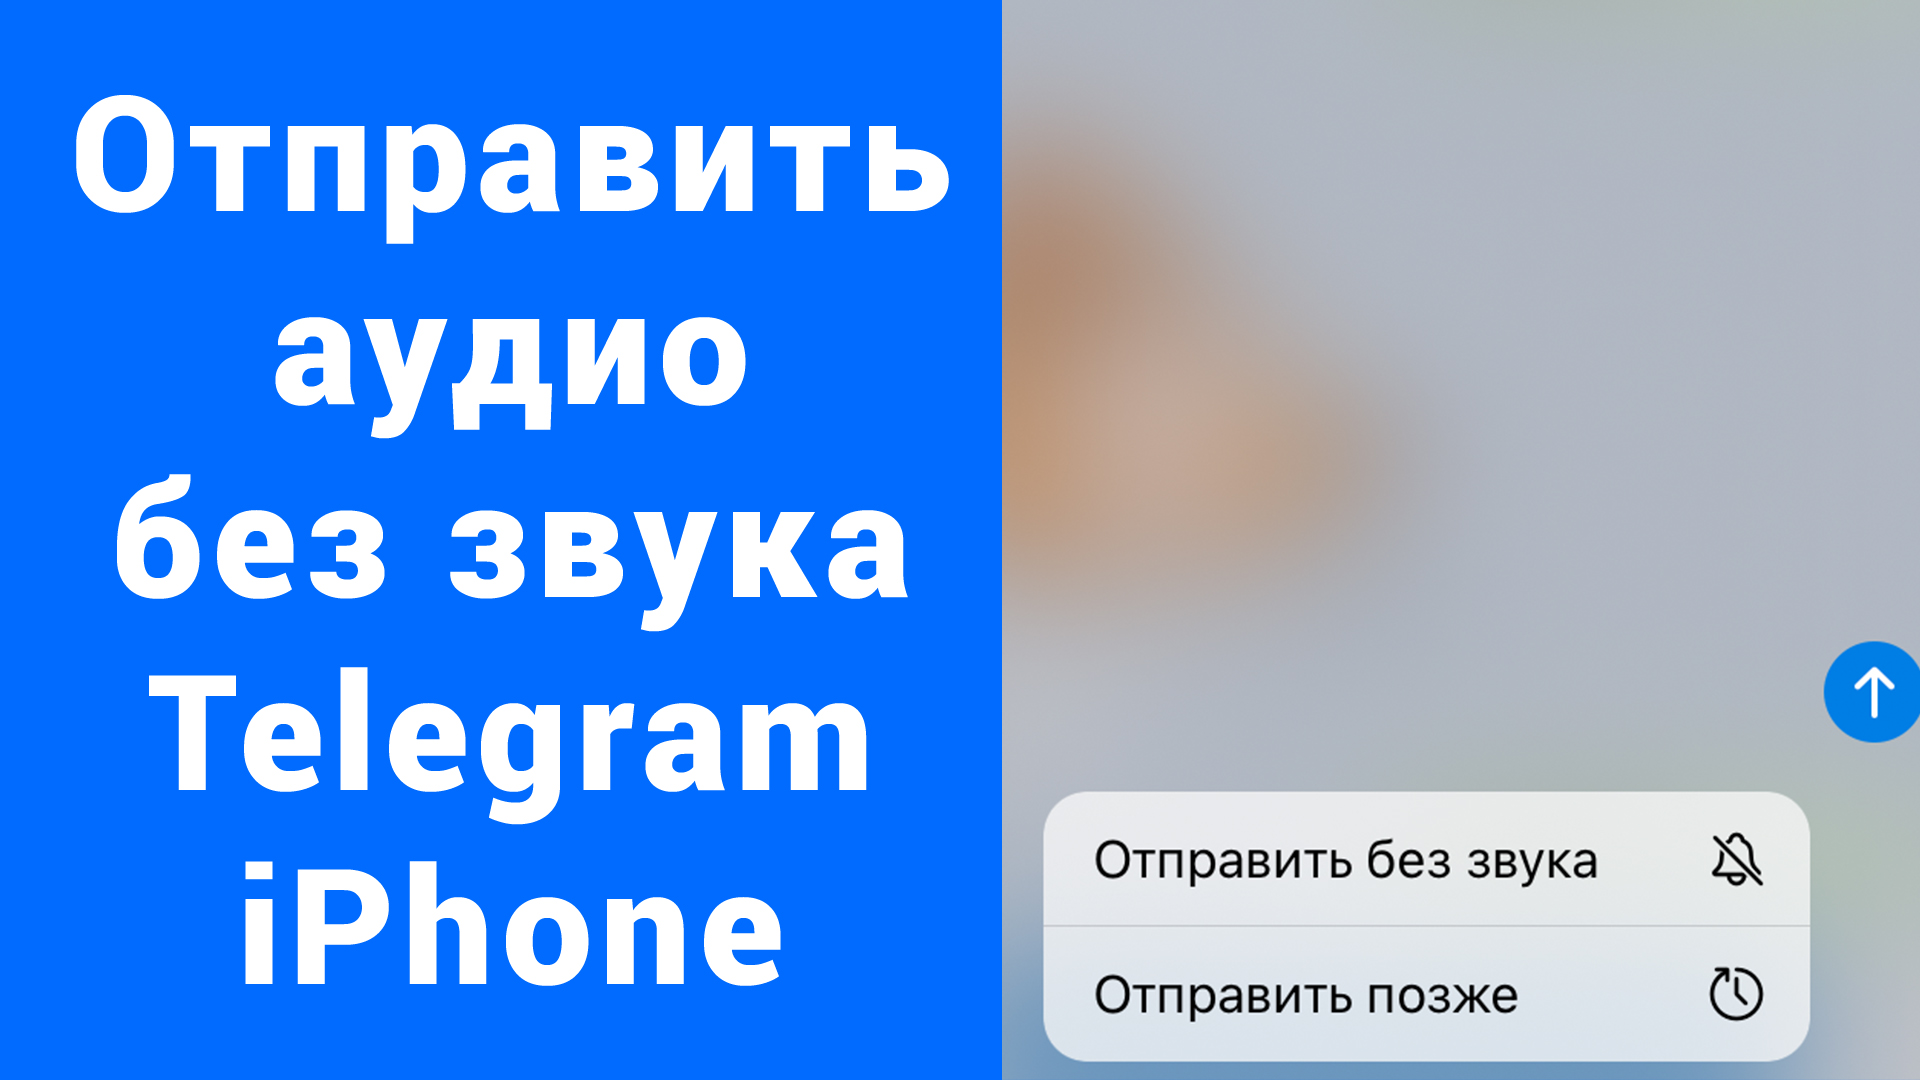 Отправить аудио голос Телеграмм без звука iPhone беззвучно